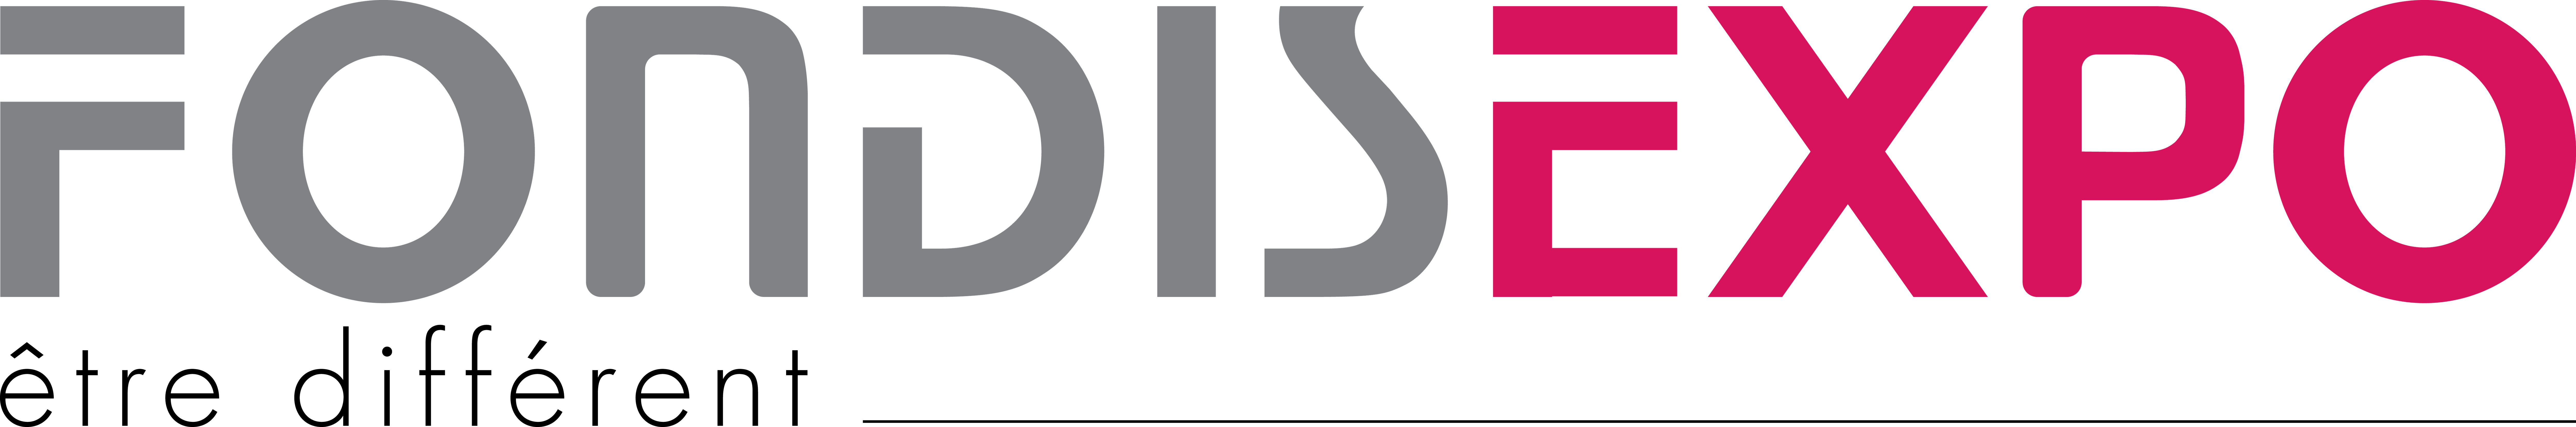 FONDISEXPO_logo_web_png2